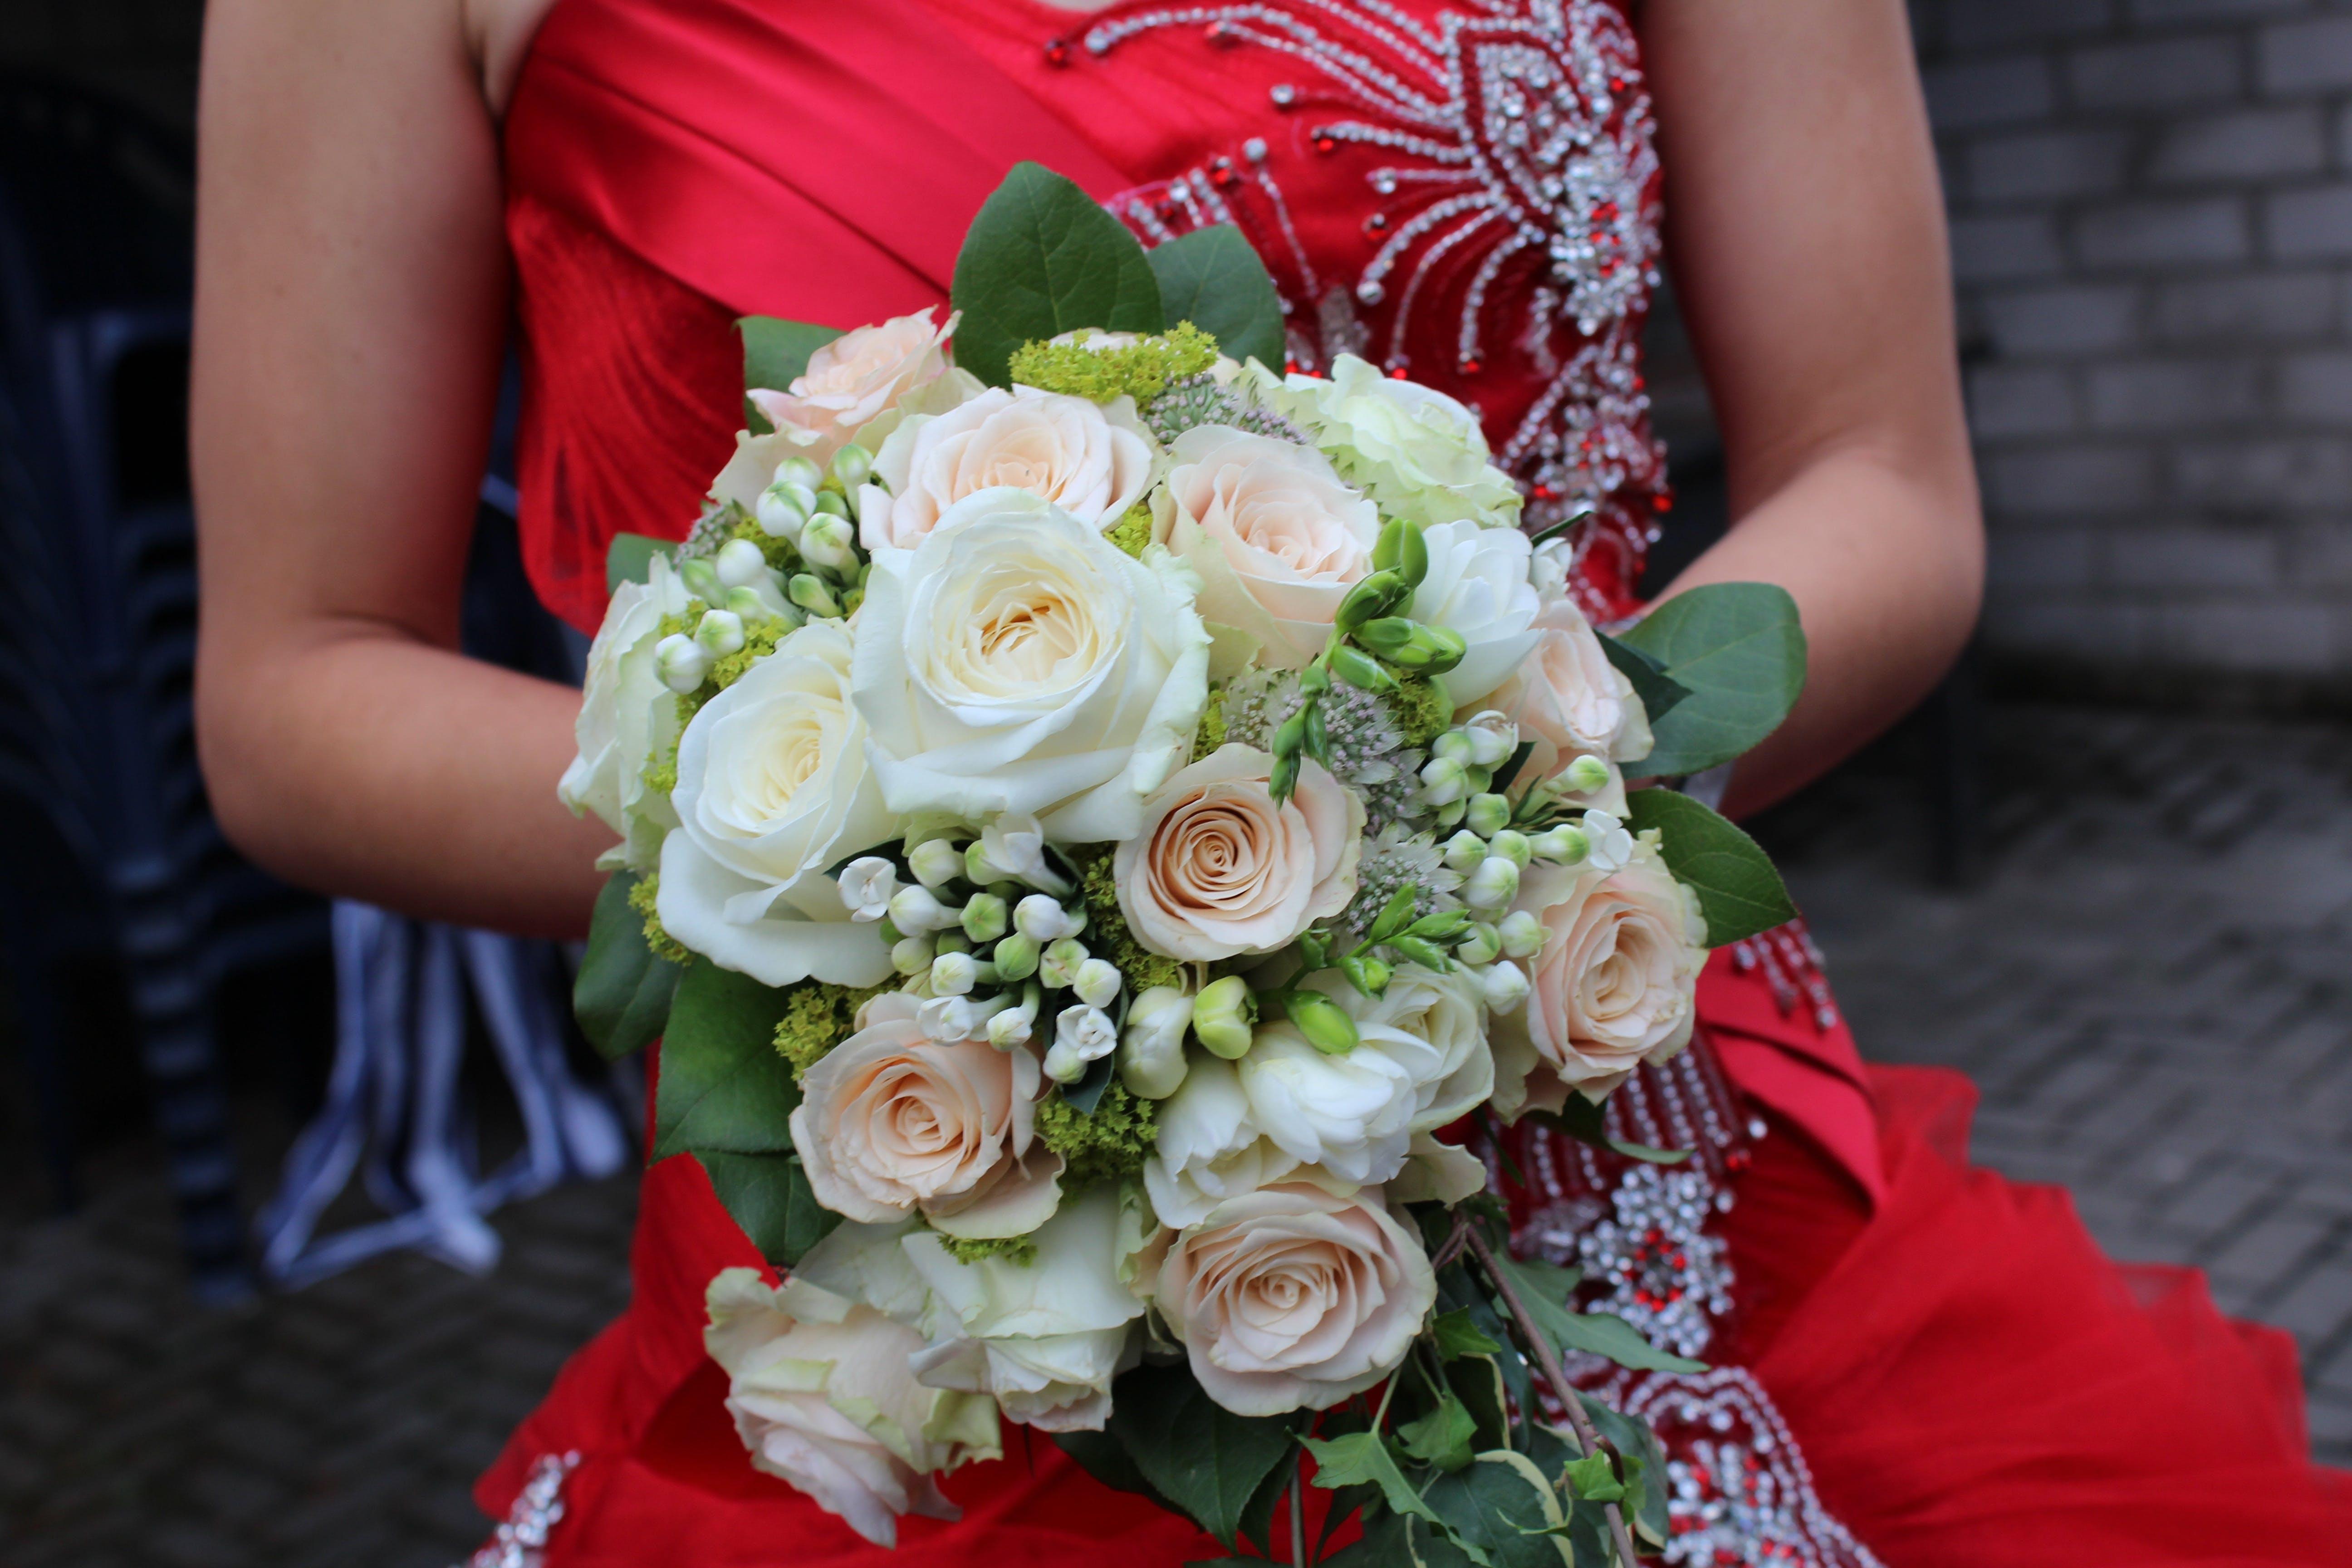 Free stock photo of flowers, bouquet, queen, düsseldorf